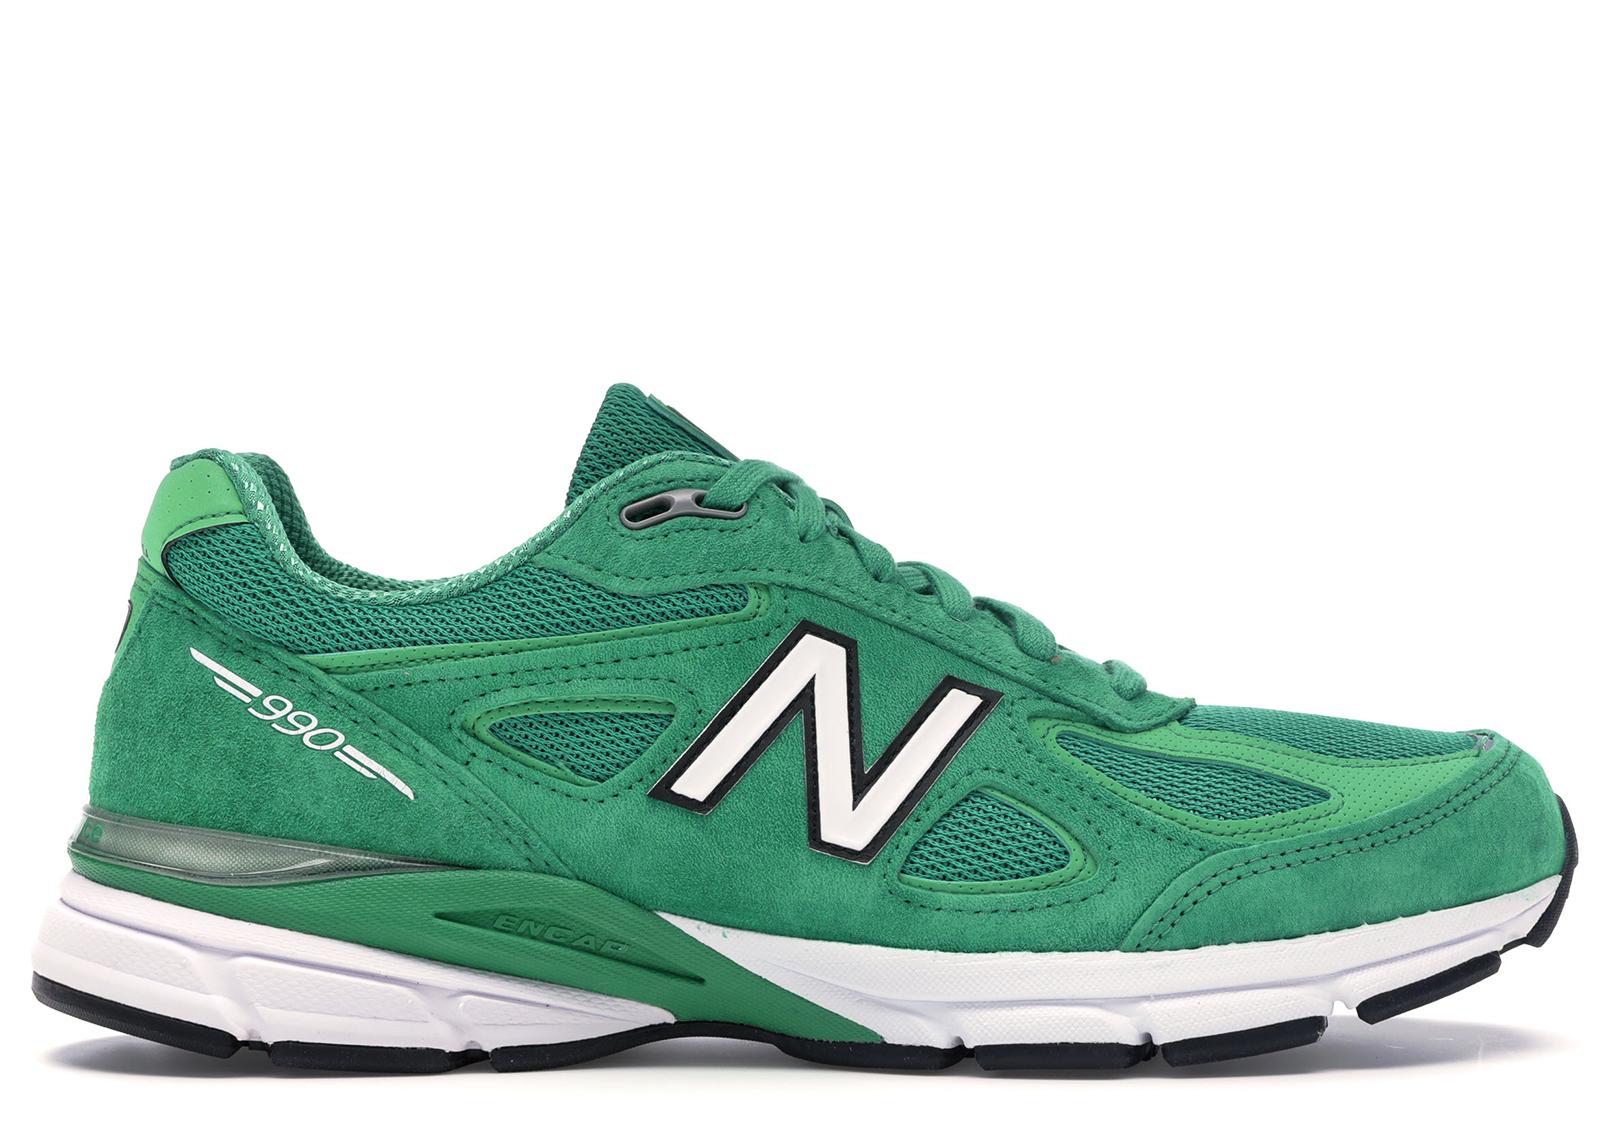 New Balance 990v4 Green